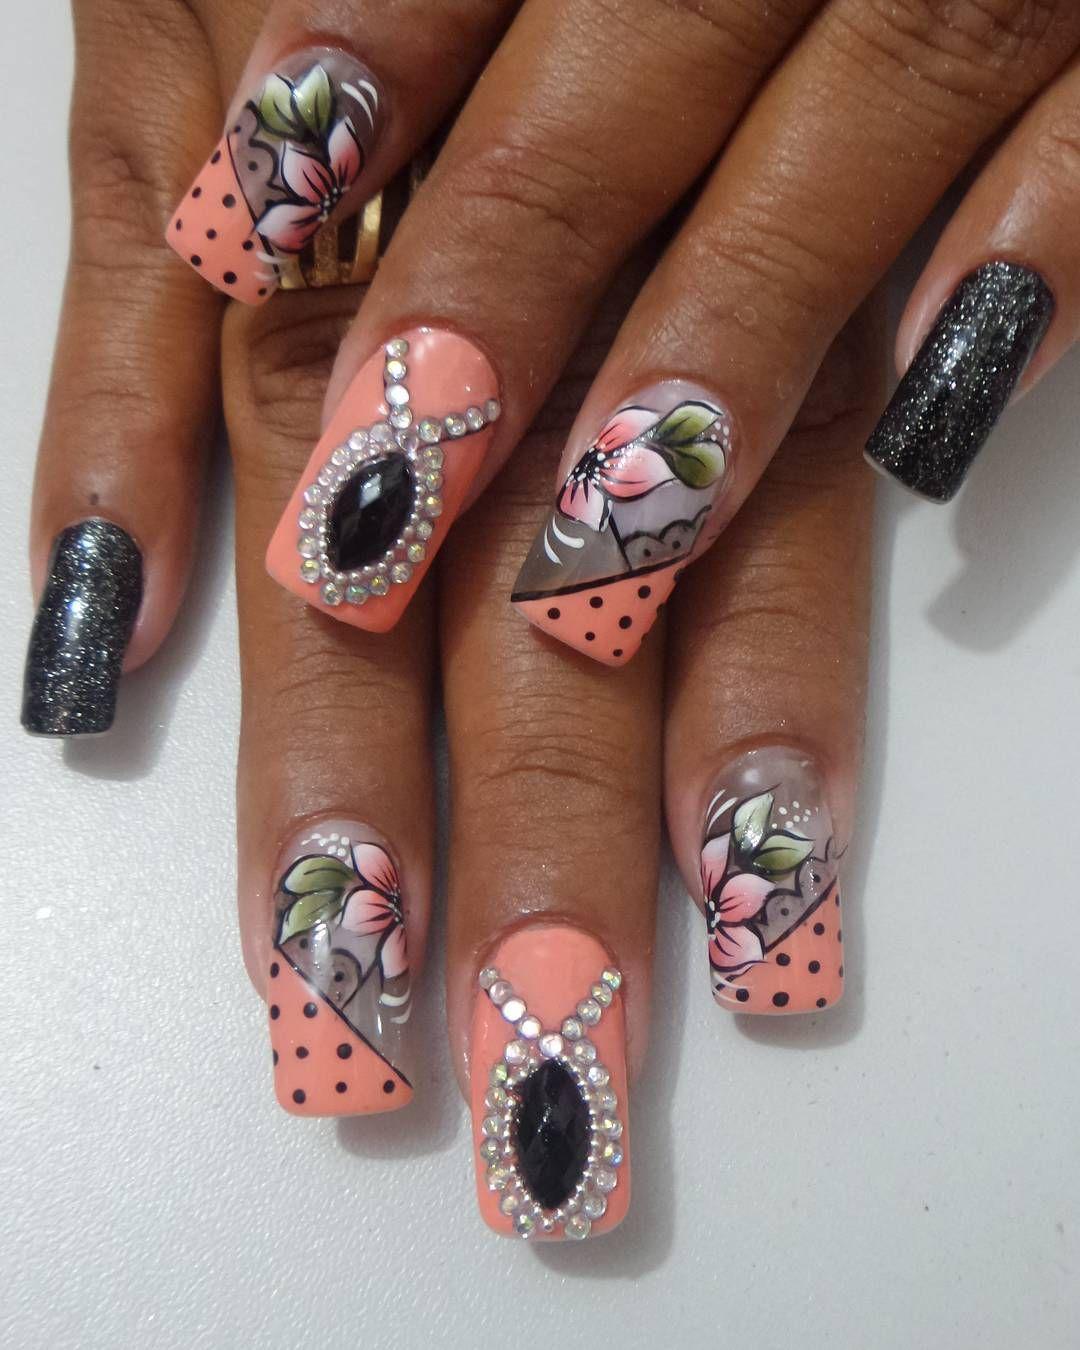 Pin by Lelu Nail on Unhas decoradas | Pinterest | Bling nails ...